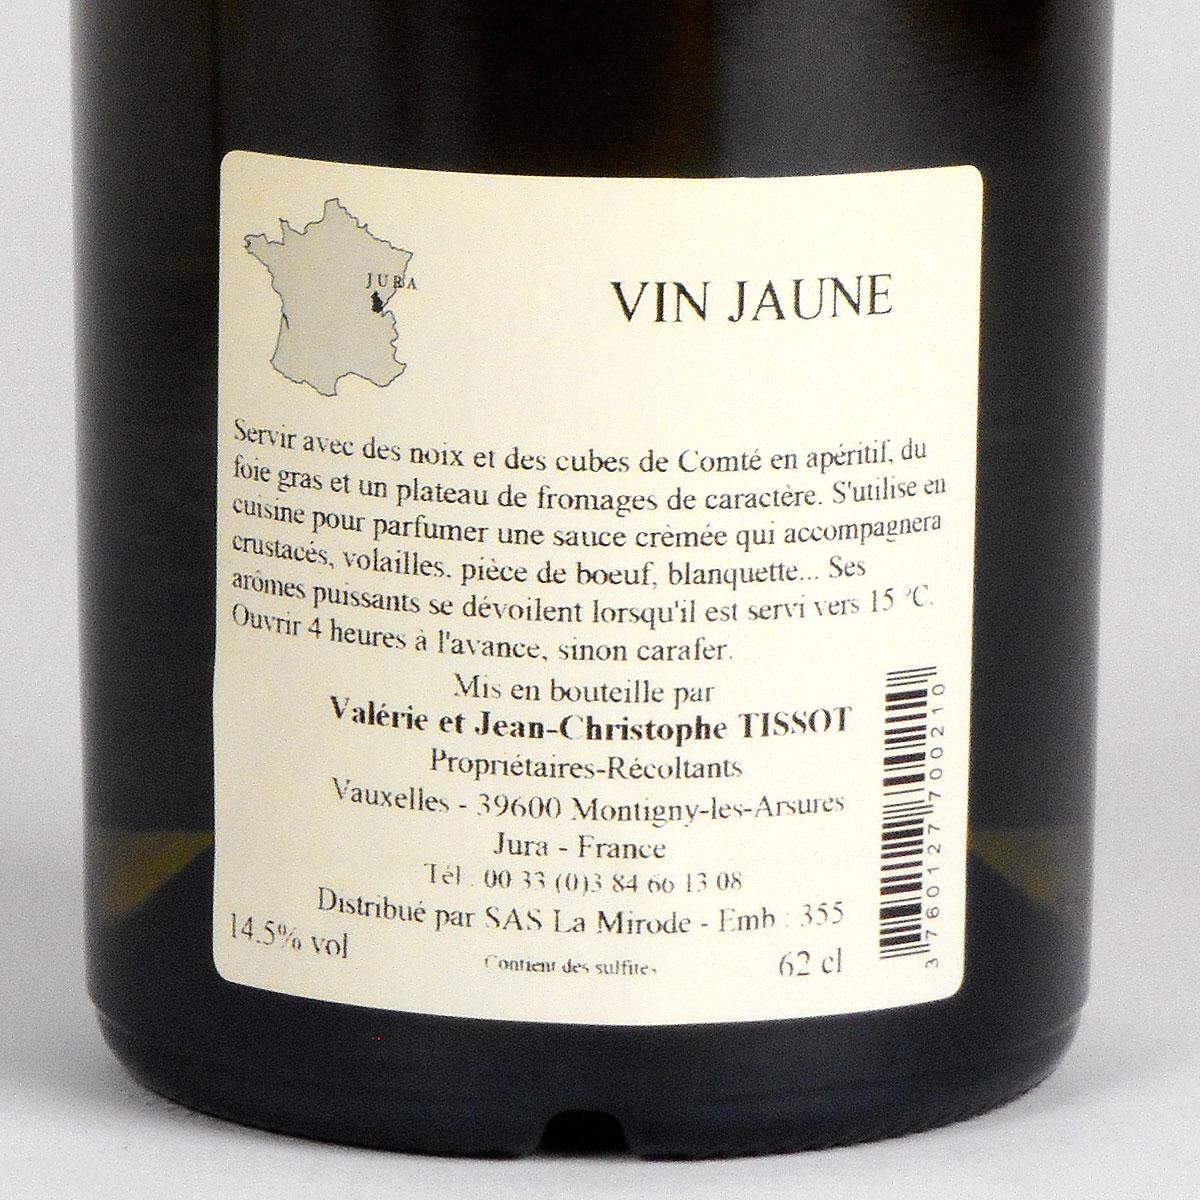 Jura Arbois: Vin Jaune Domaine Jean-Louis Tissot 2013 - Bottle Rear Label